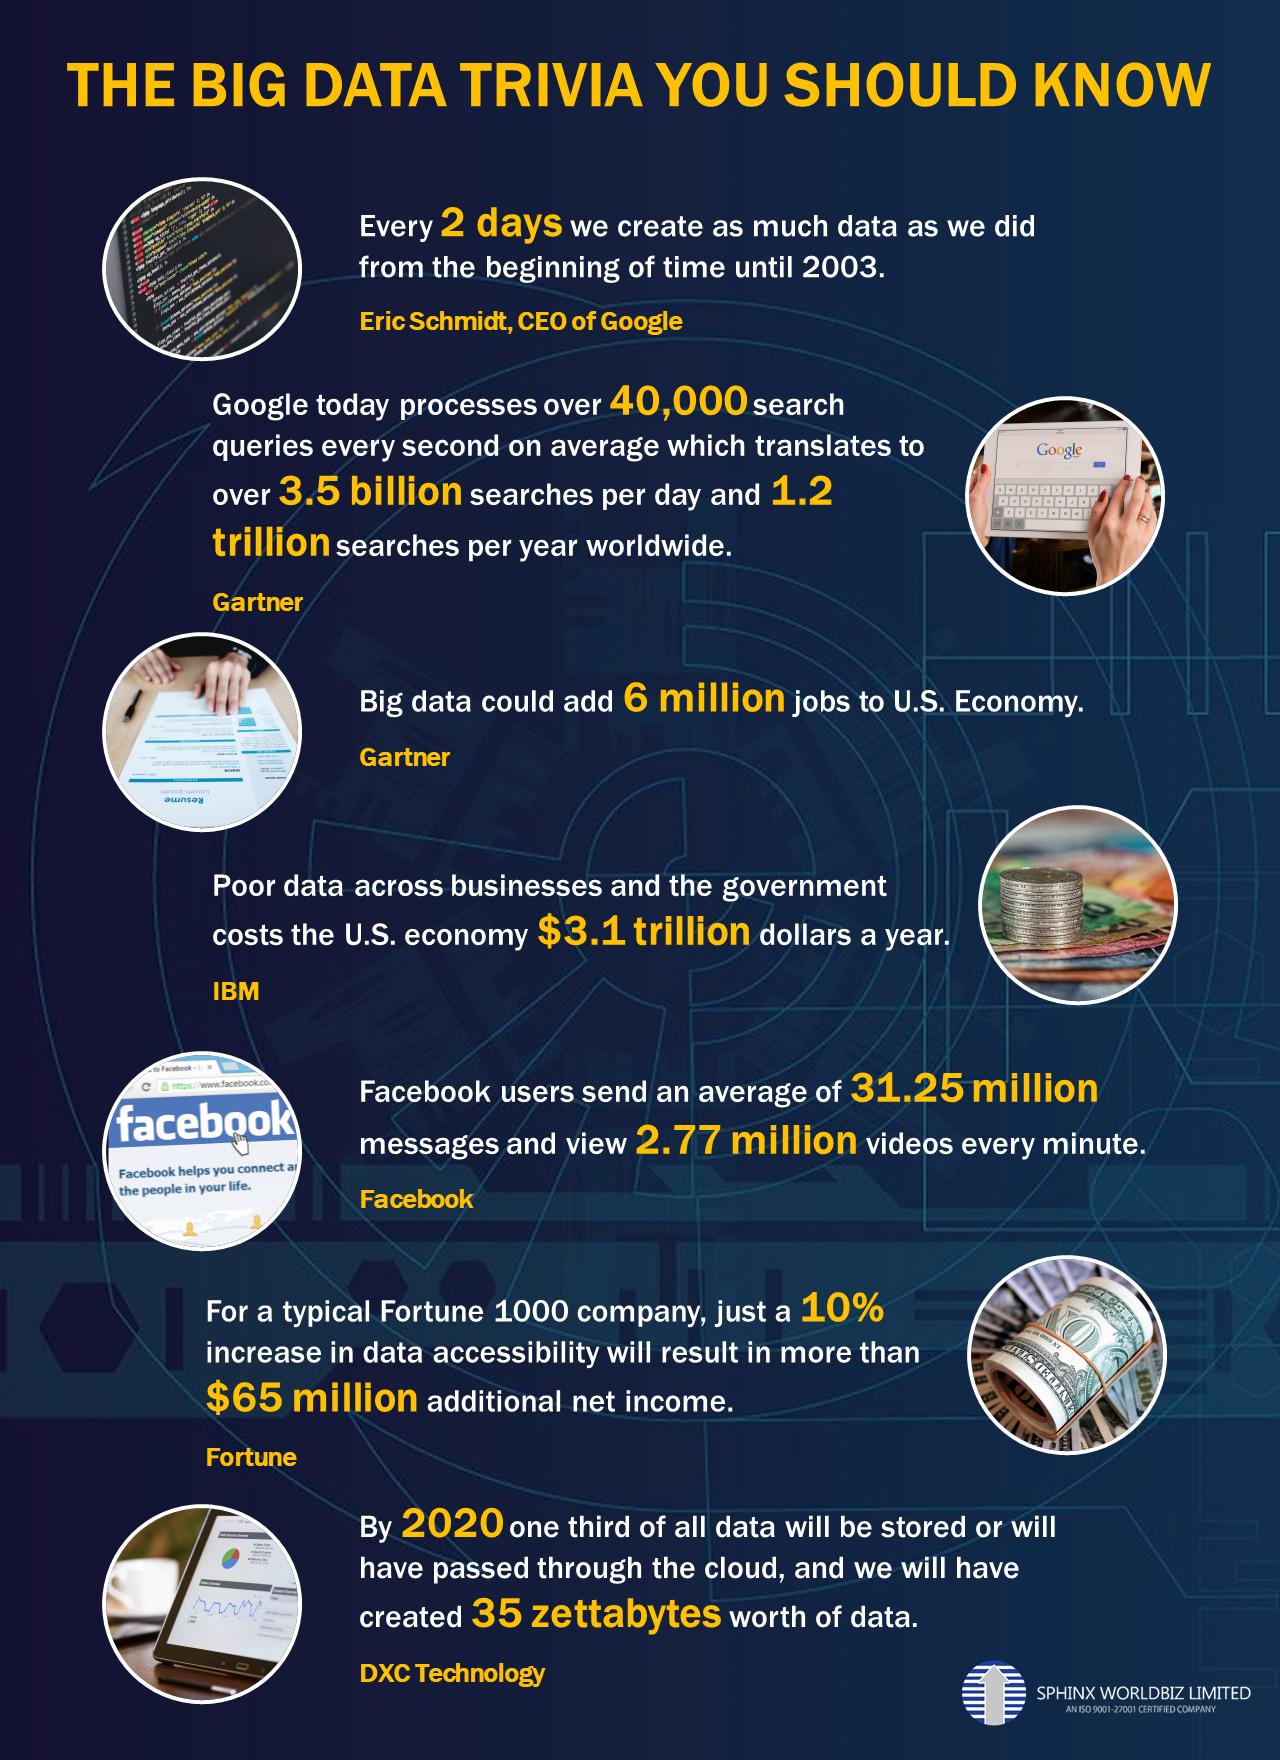 Infographic on Big Data Trivia